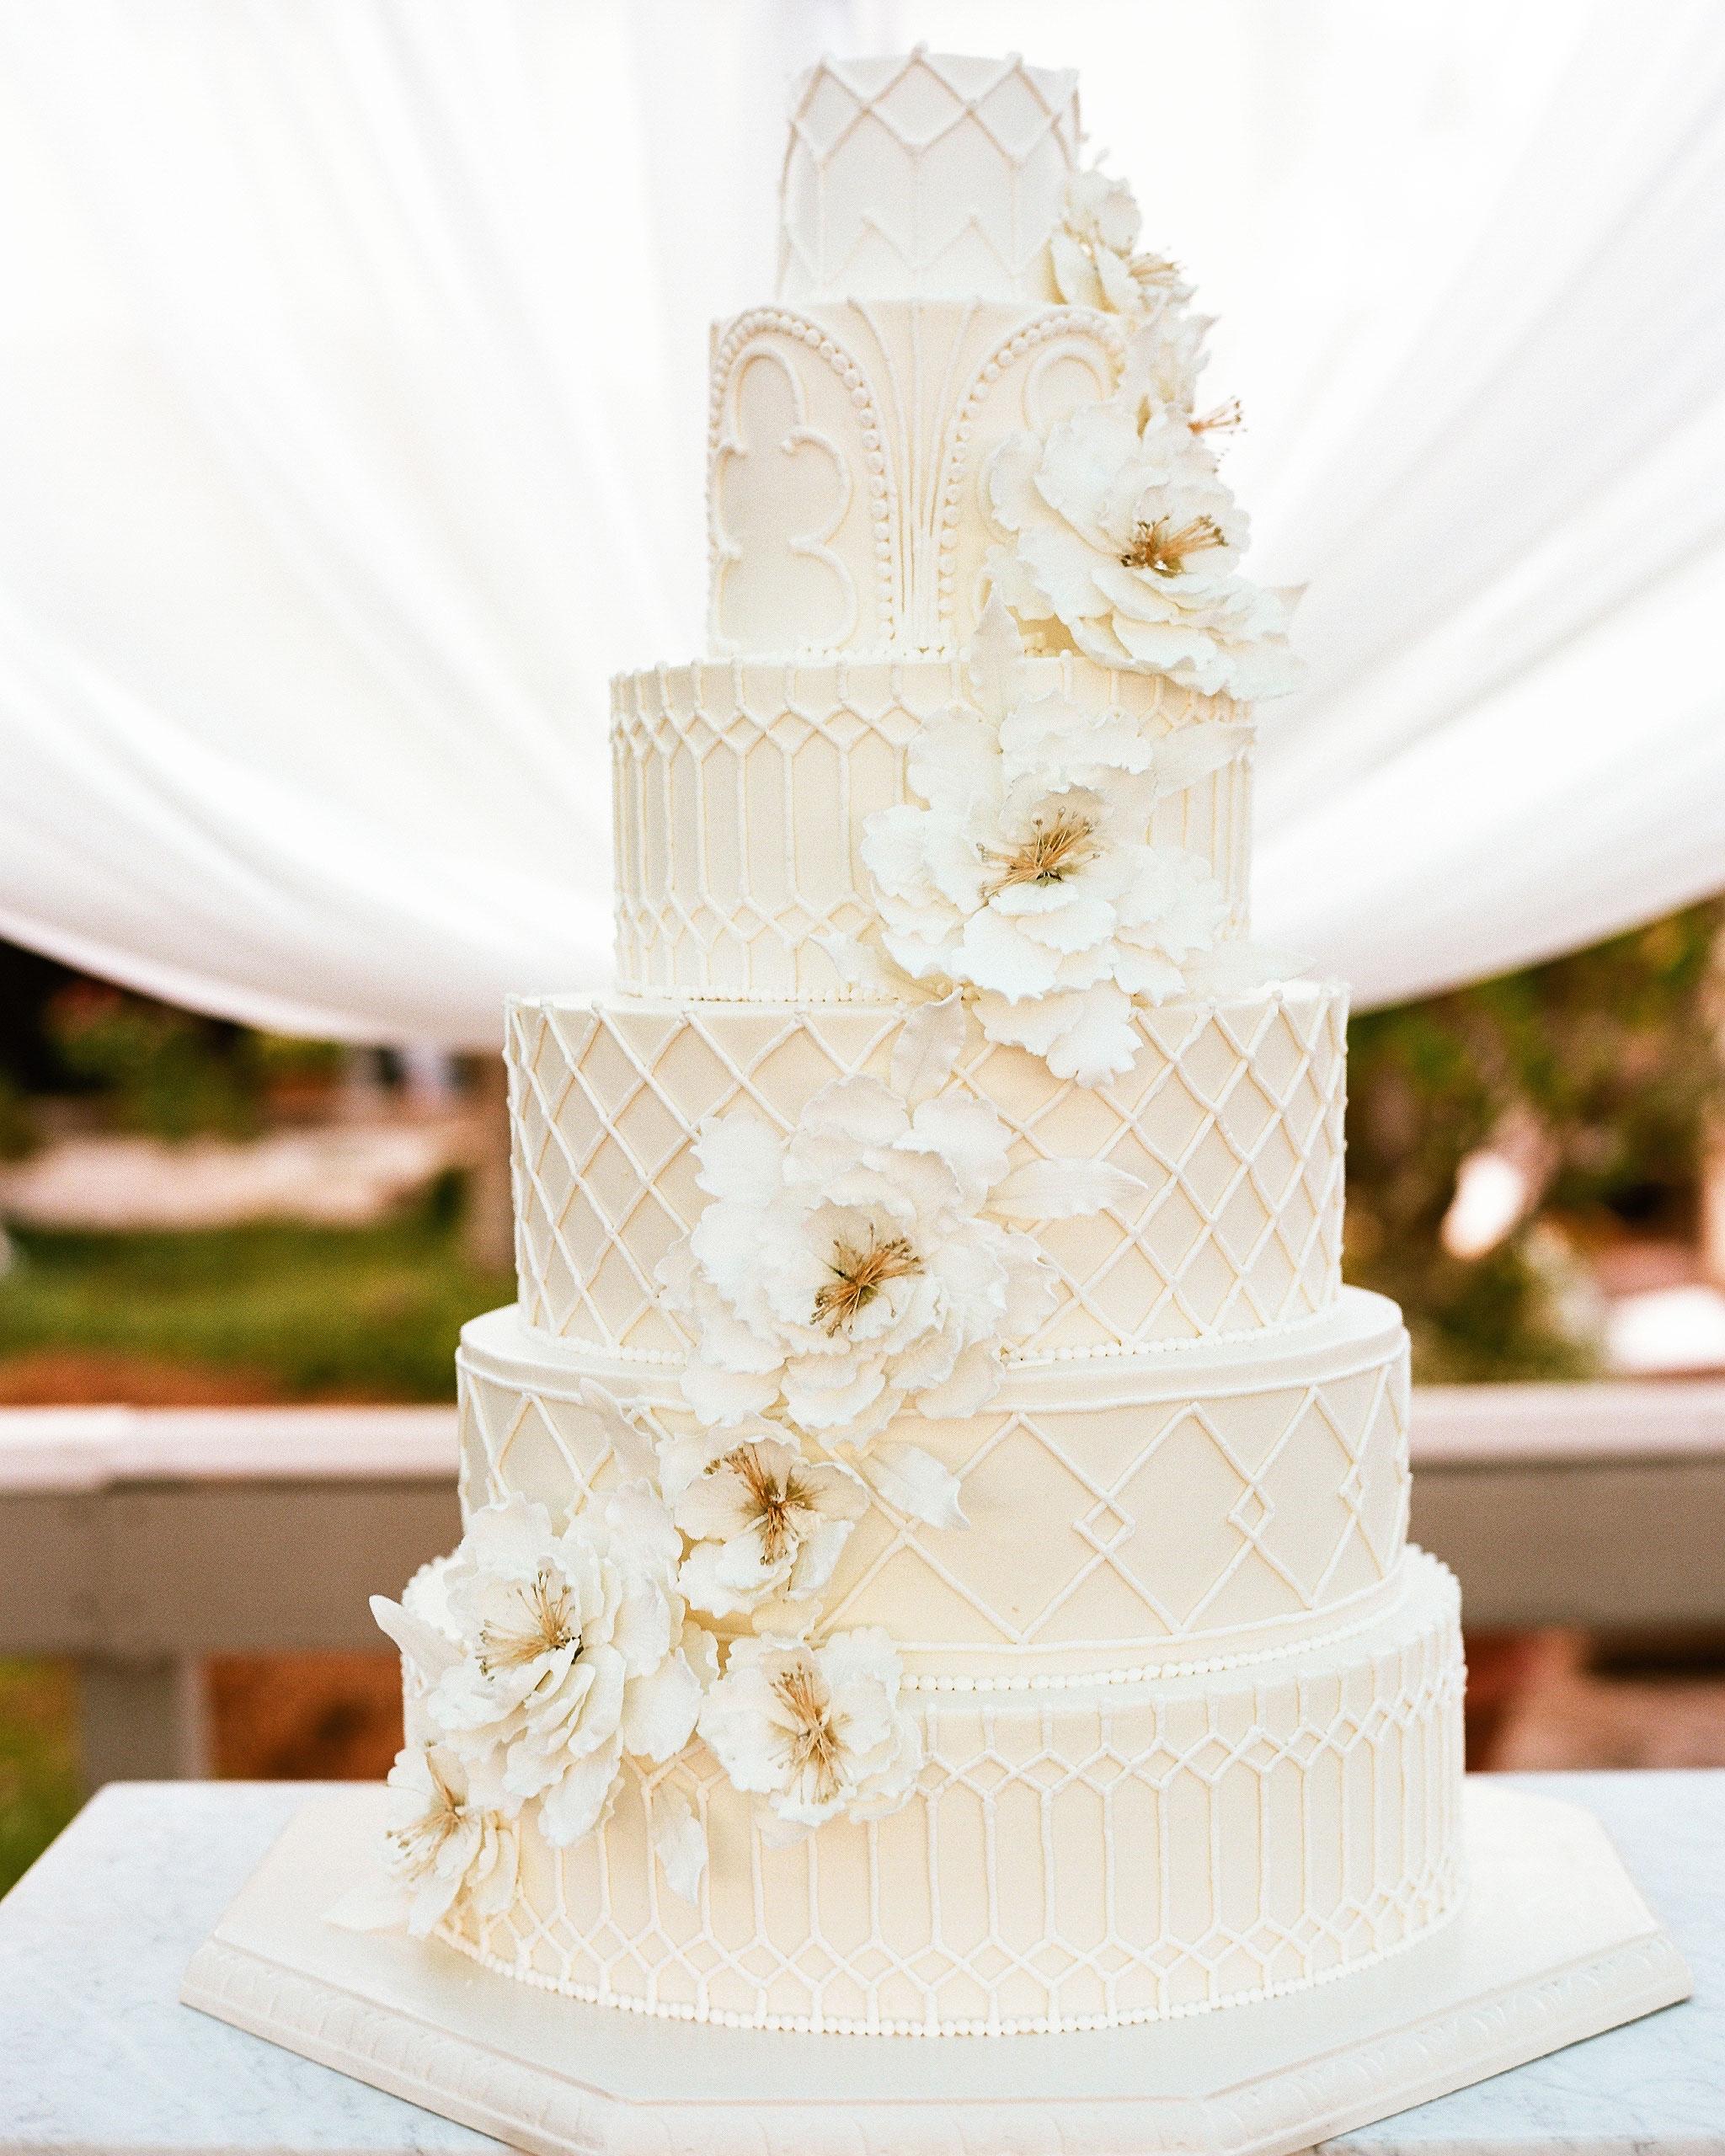 nancy-nathan-wedding-cake-1124-6141569-0816.jpg